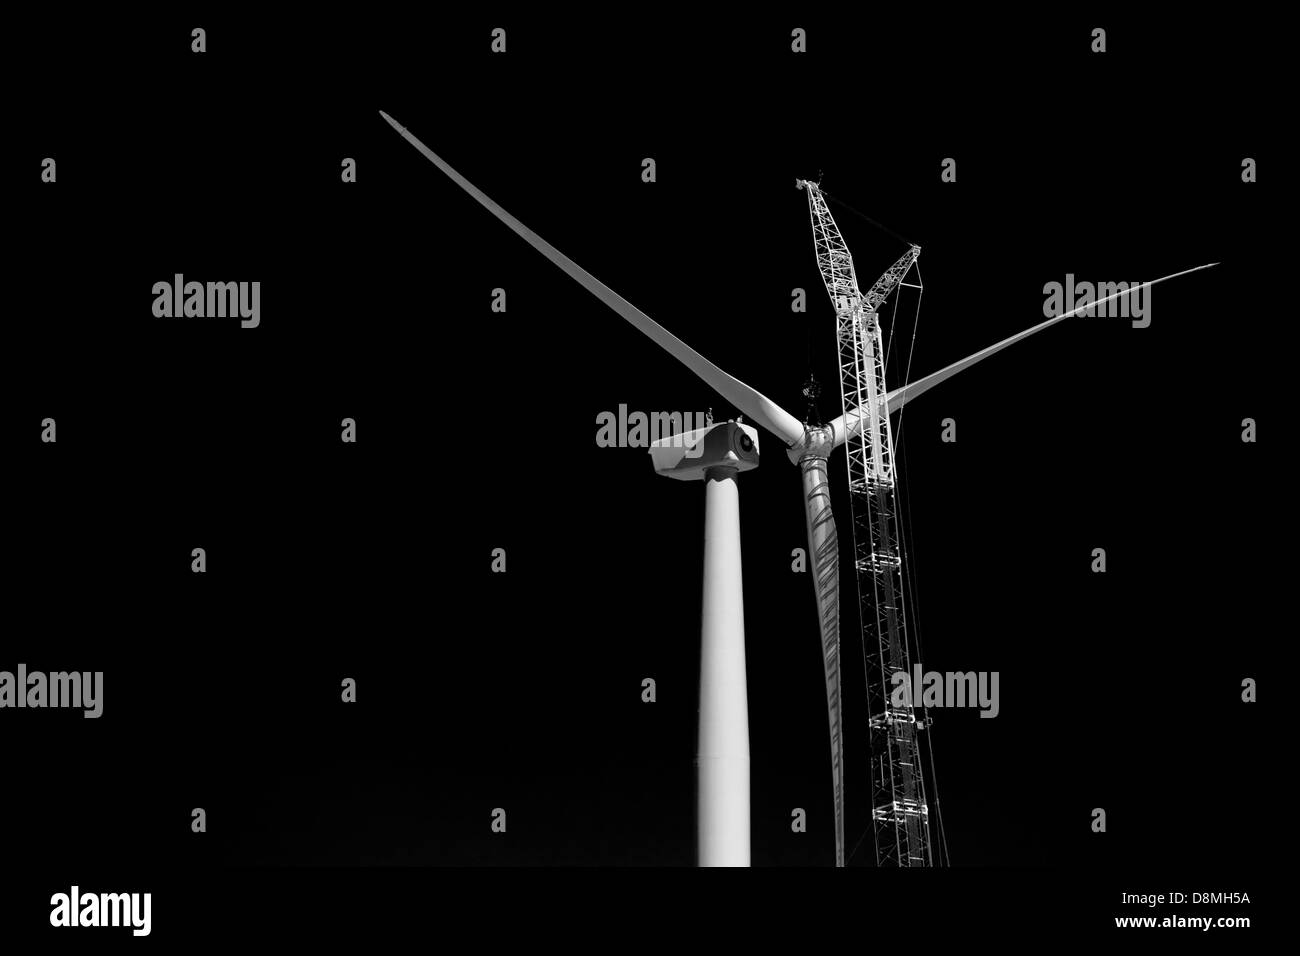 Wind Farm Construction - Stock Image